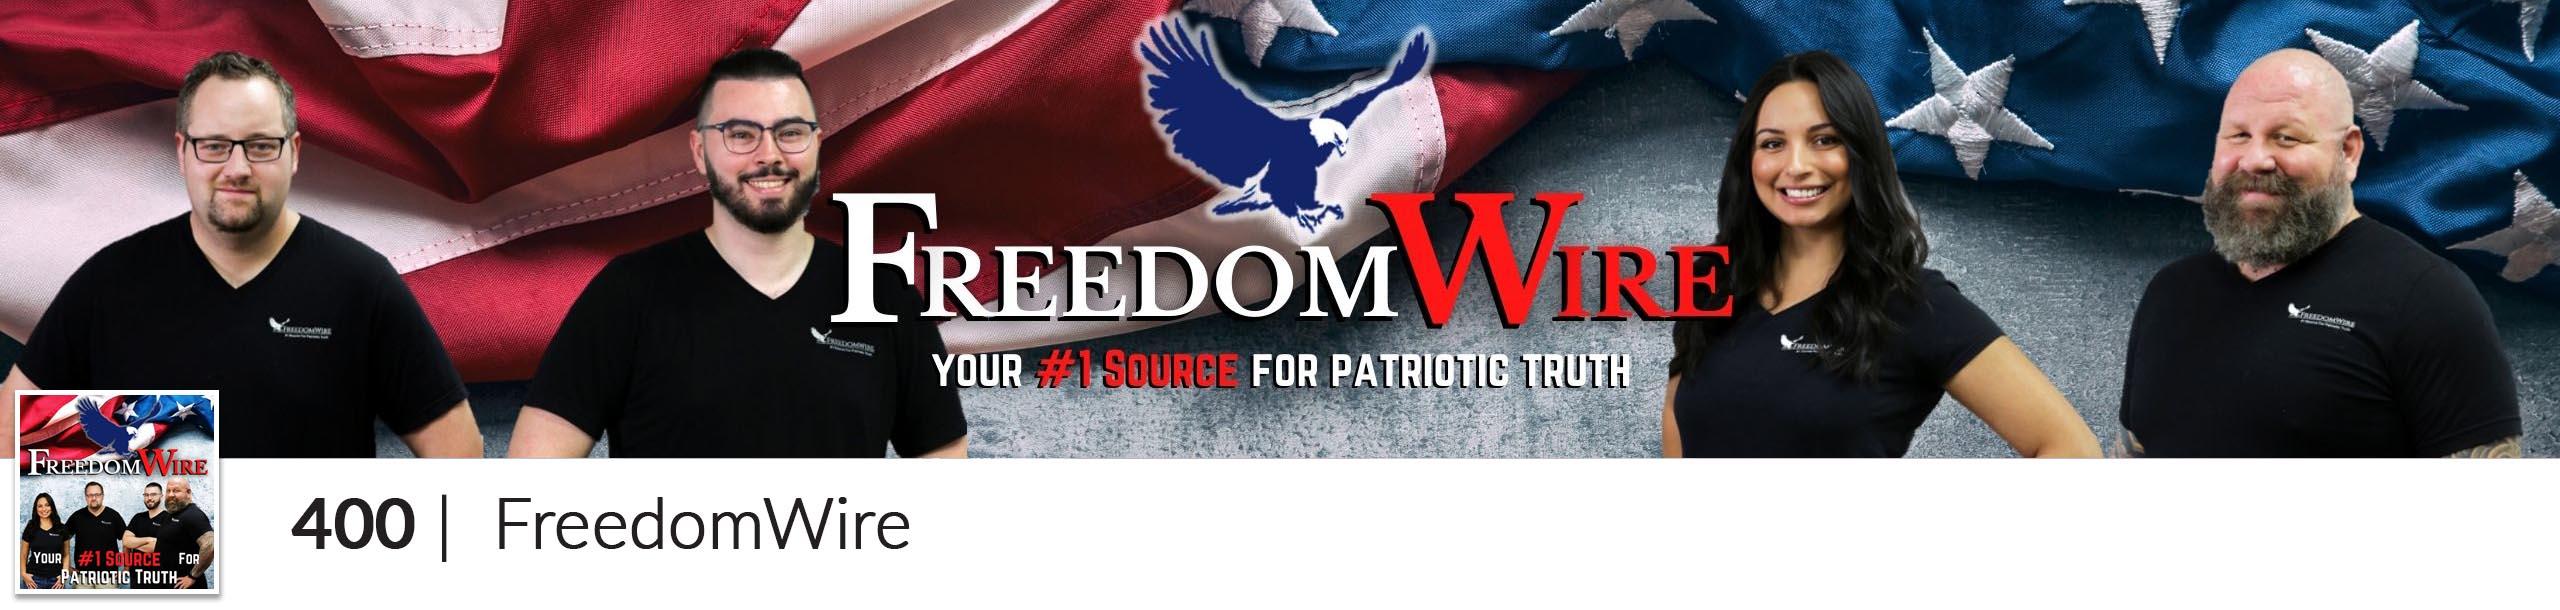 FreedomWire-header01